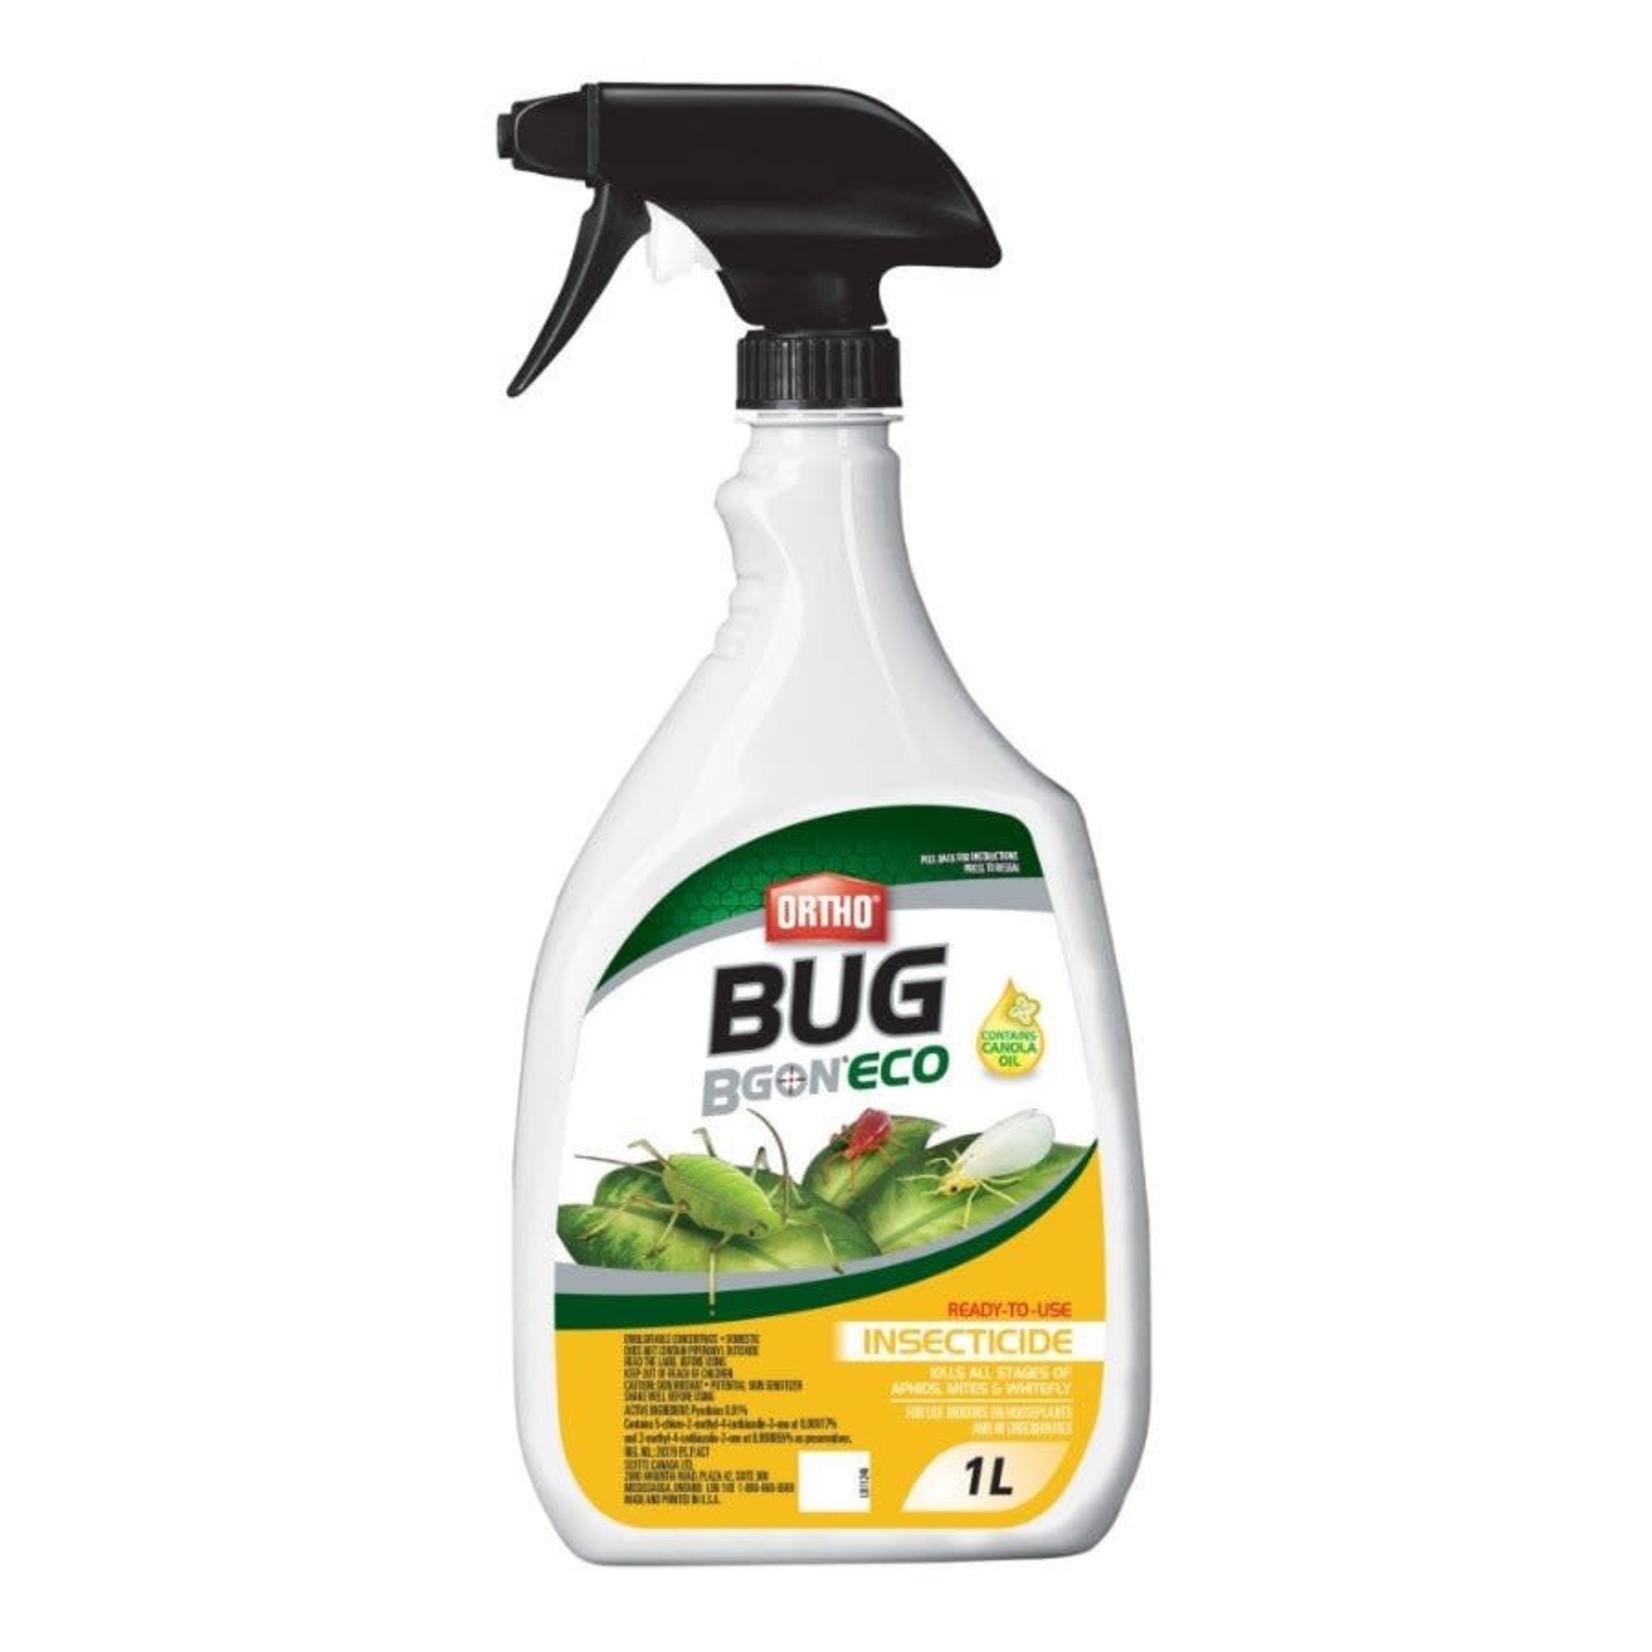 Ortho Bug B Gon Eco Insecticide RTU 1L